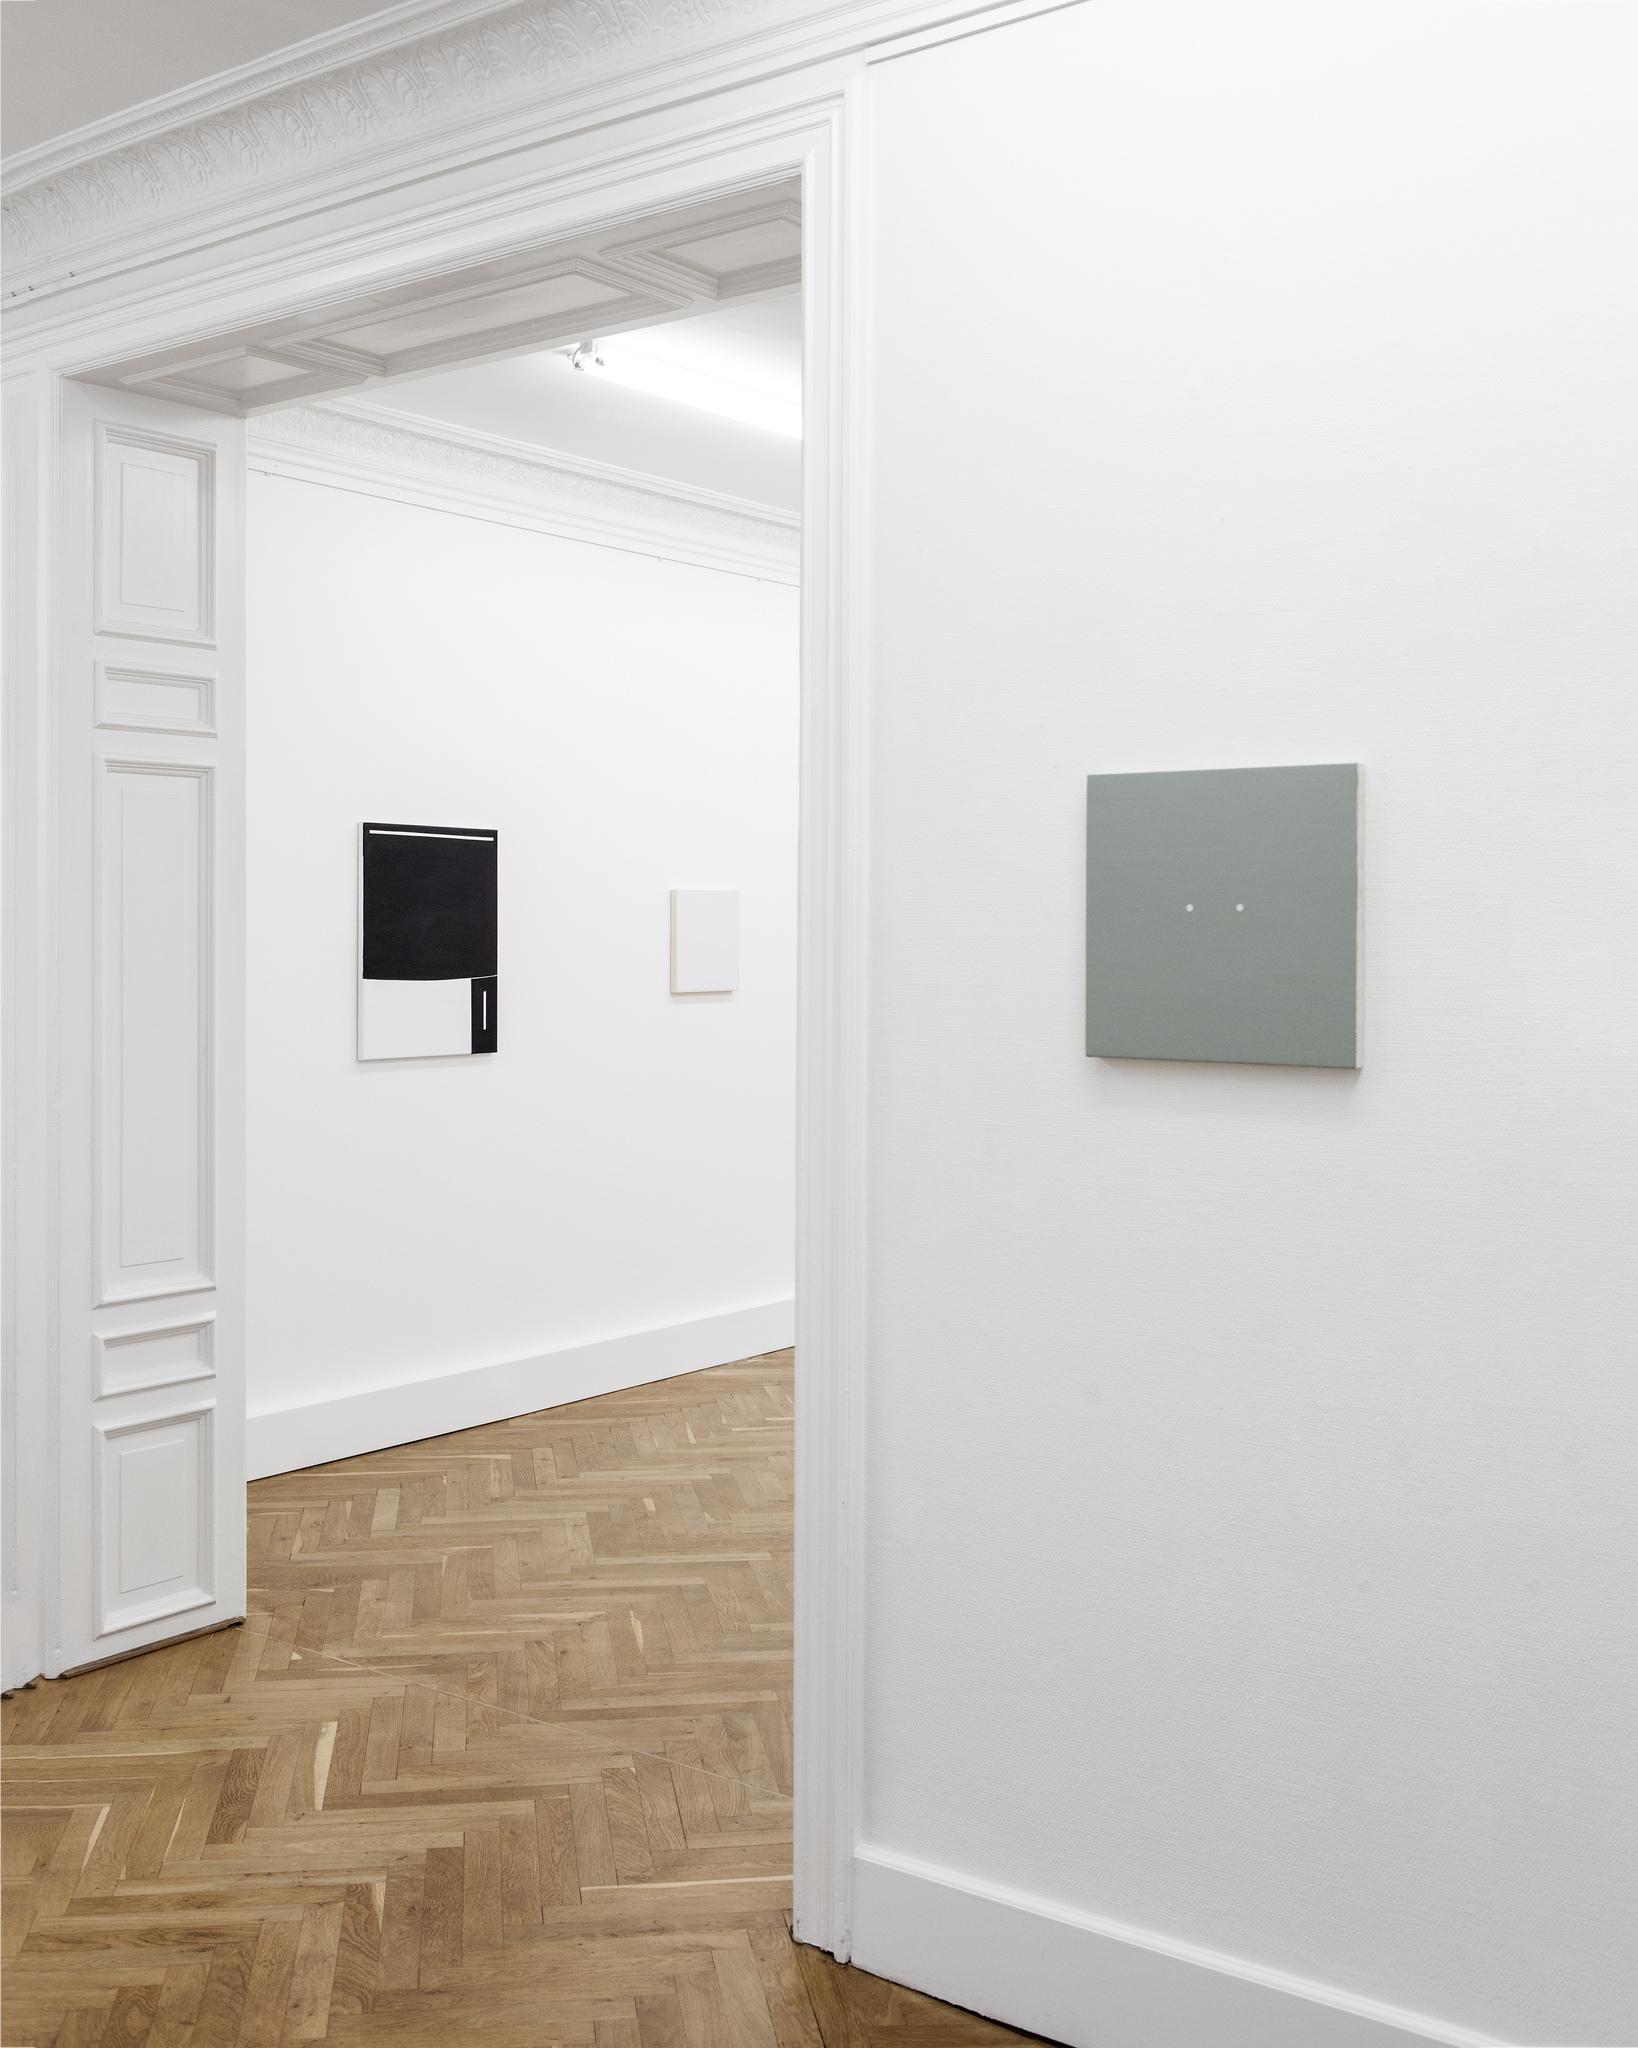 1-4-andre-butzer-matthew-feyld-sundays-gallery